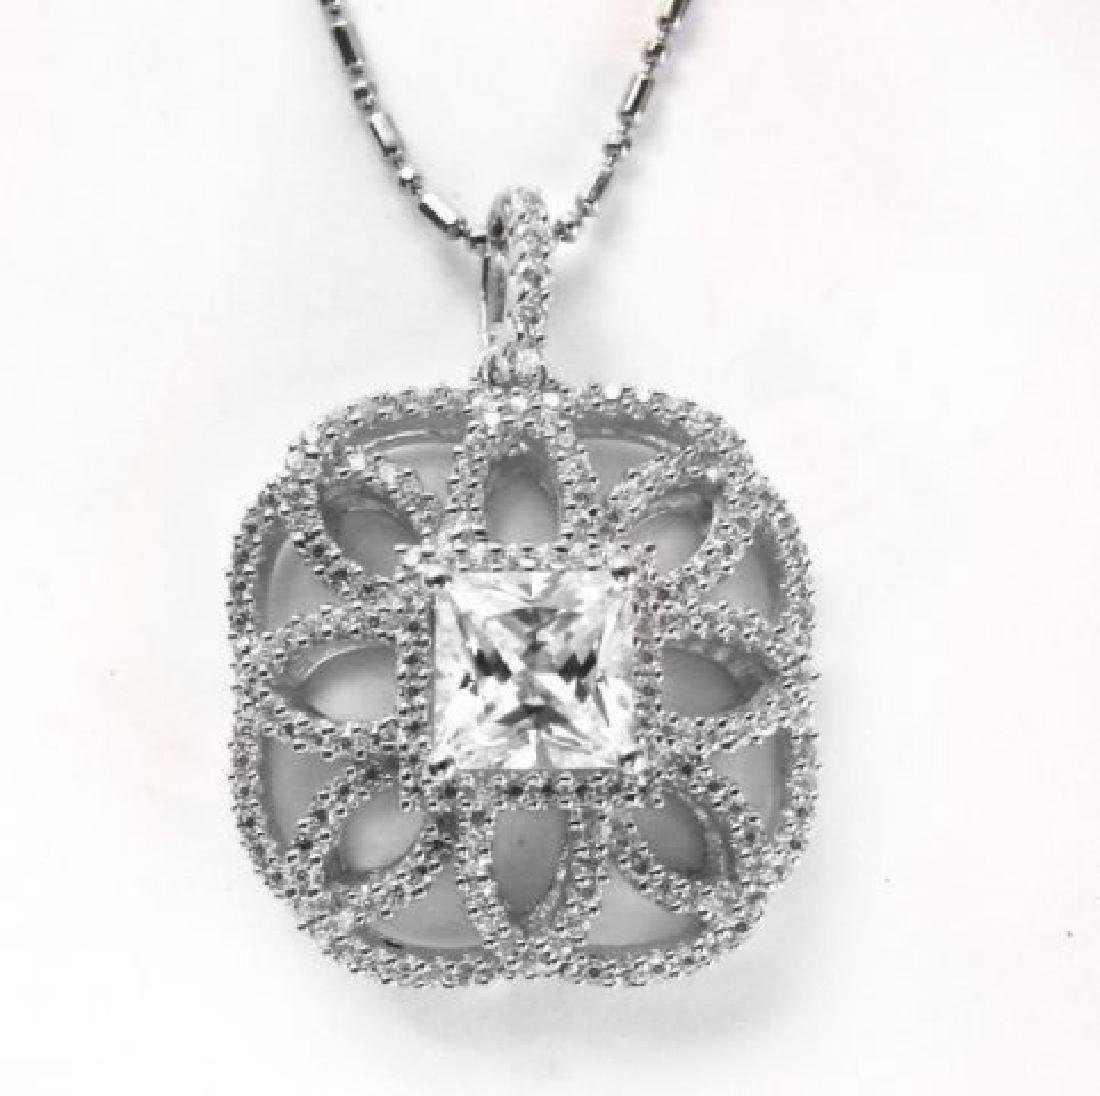 Pendant Diamonds Creation 4.05ct 18k W/g Overlay - 3